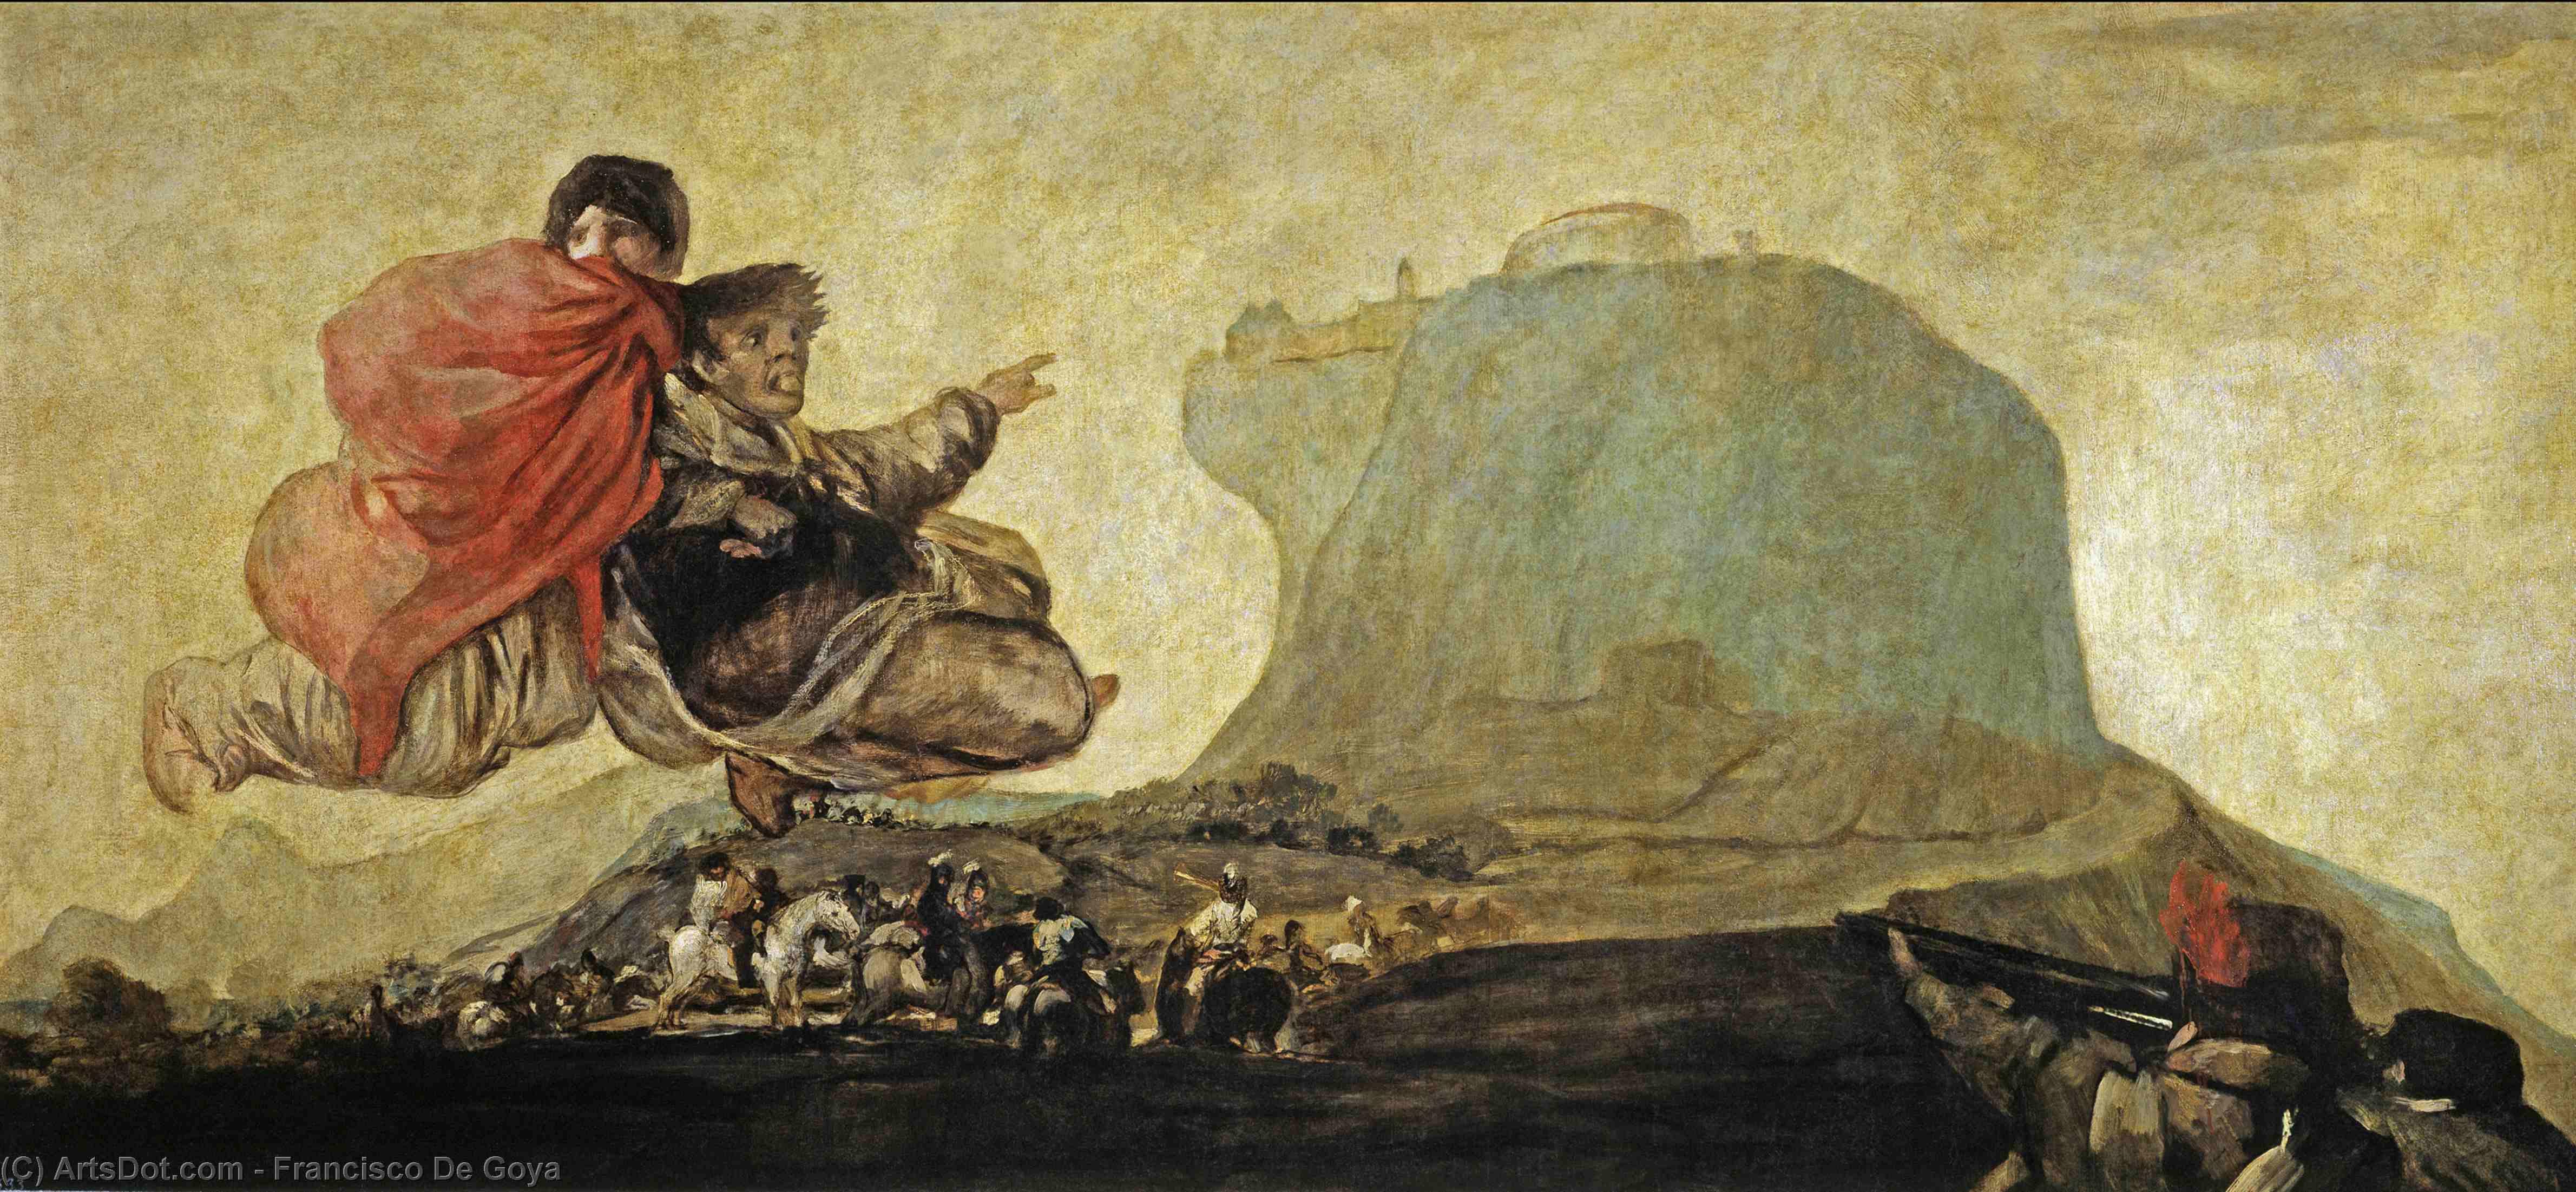 Wikioo.org - The Encyclopedia of Fine Arts - Painting, Artwork by Francisco De Goya - Asmodea